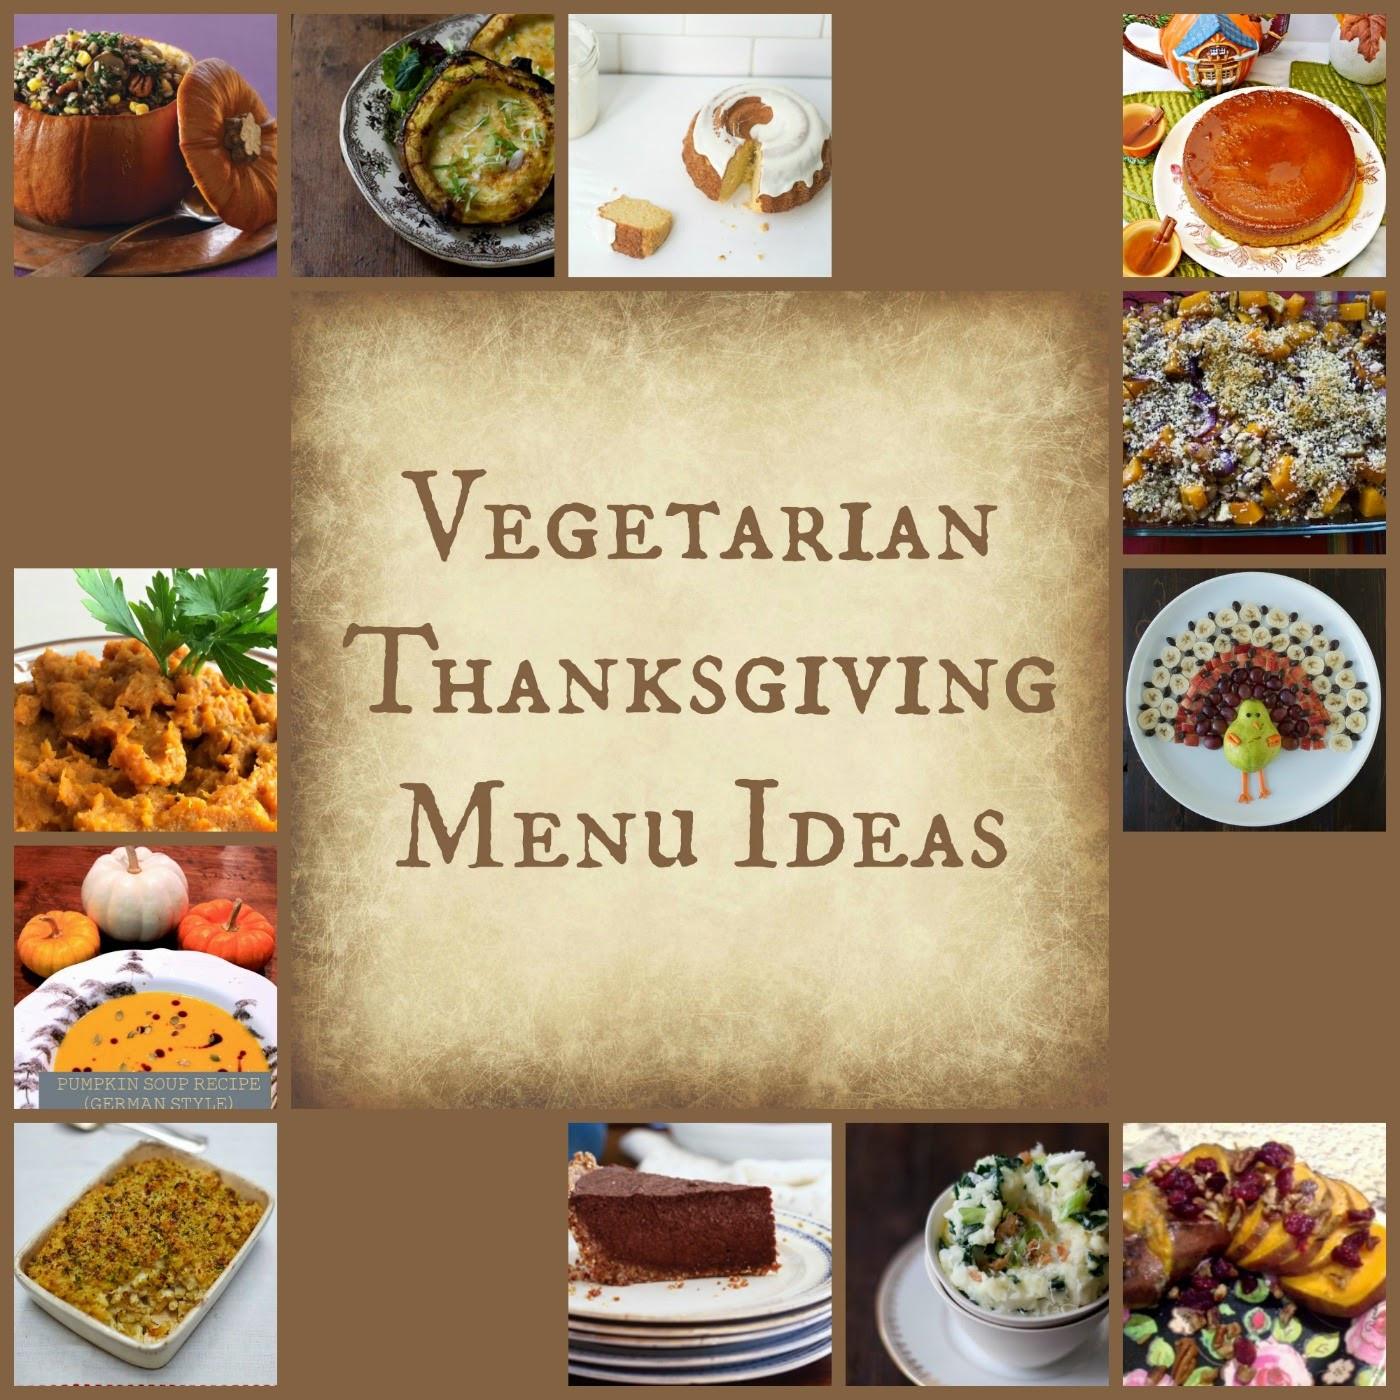 Vegetarian Thanksgiving Ideas  Reviews Chews & How Tos Ve arian Thanksgiving Ideas